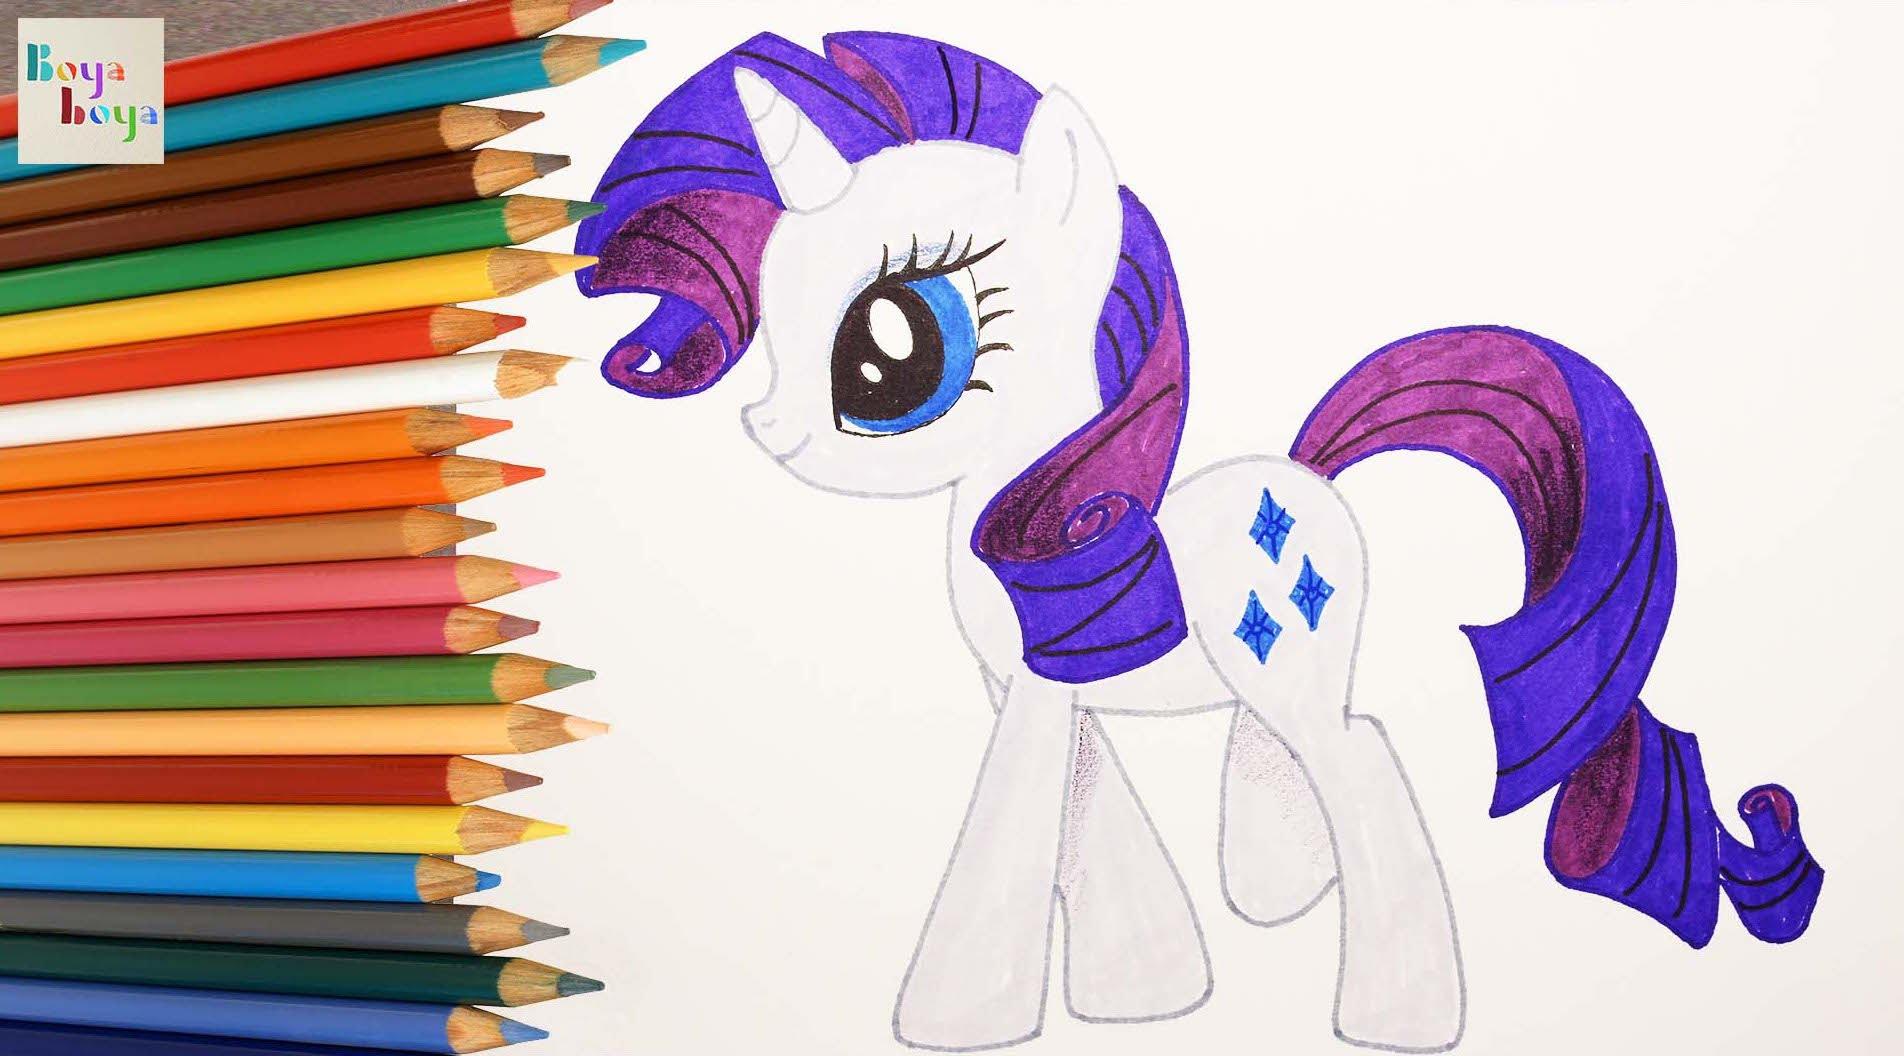 Drawn my little pony de mi Mi Pinta Pequeño Boya Boya